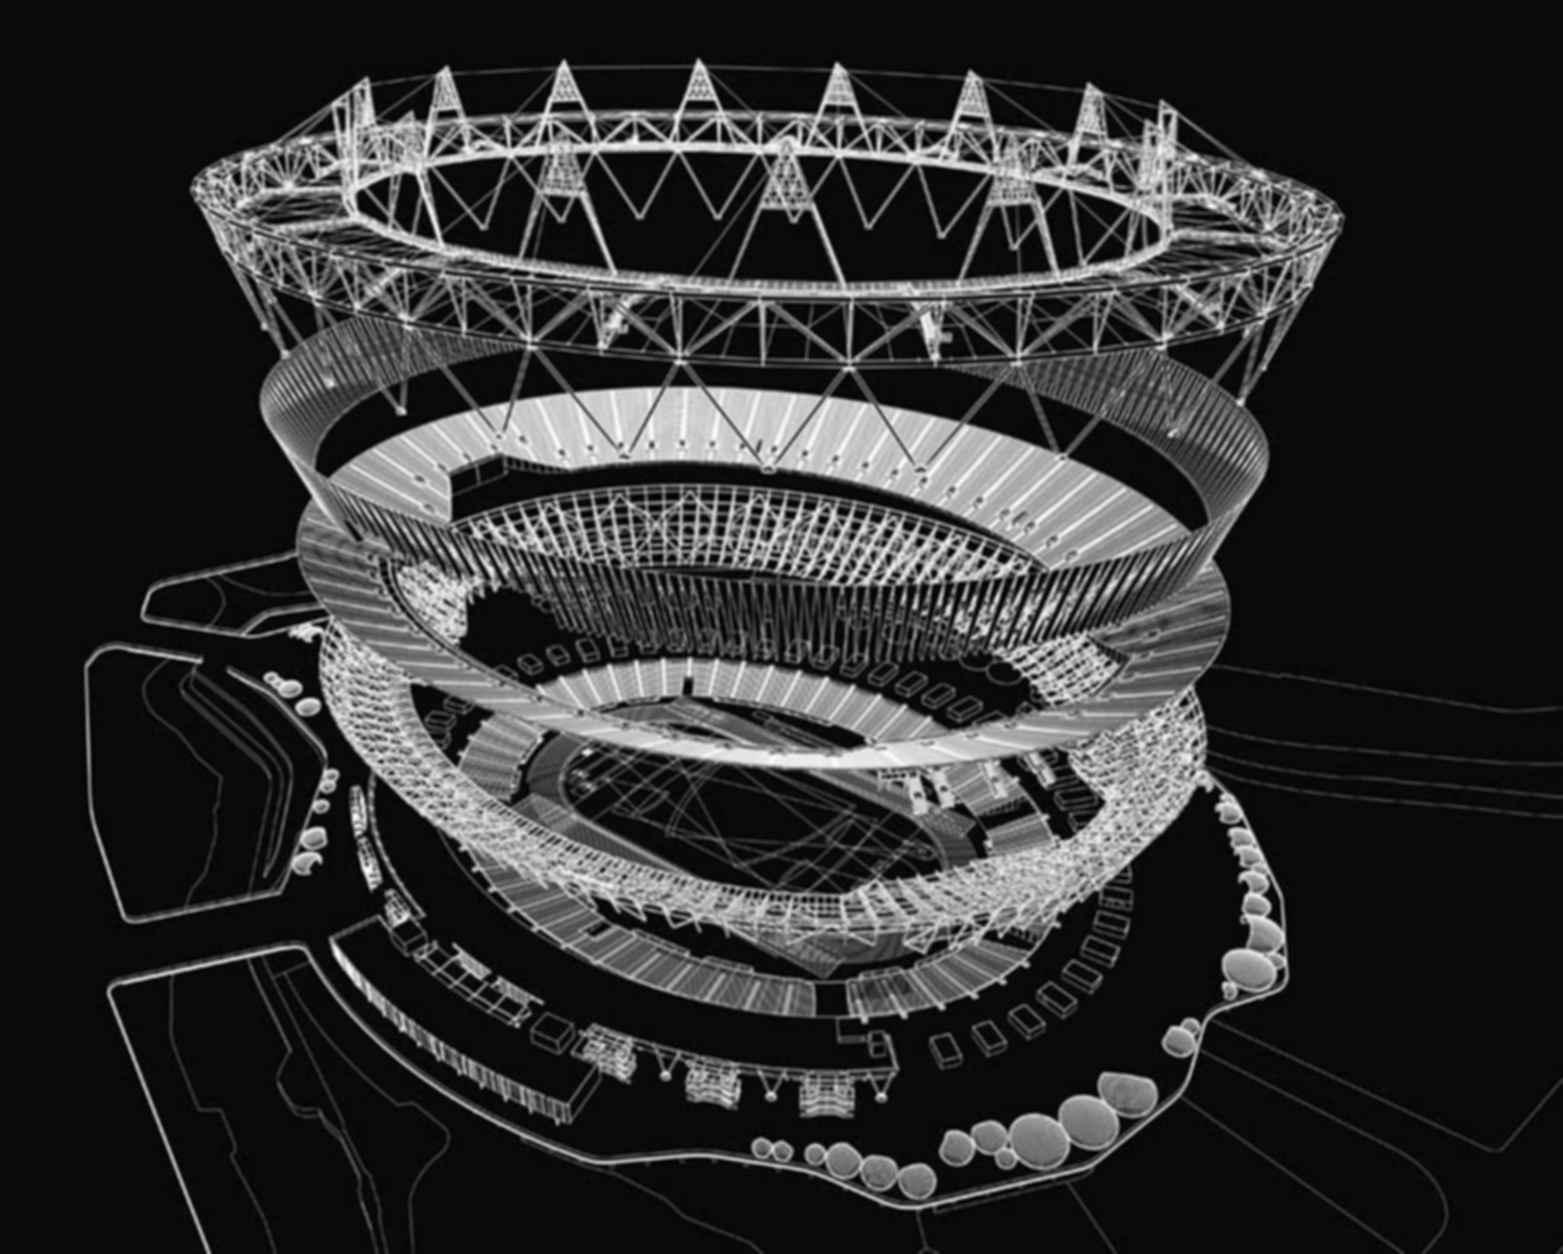 London Olympic Stadium - Concept Design